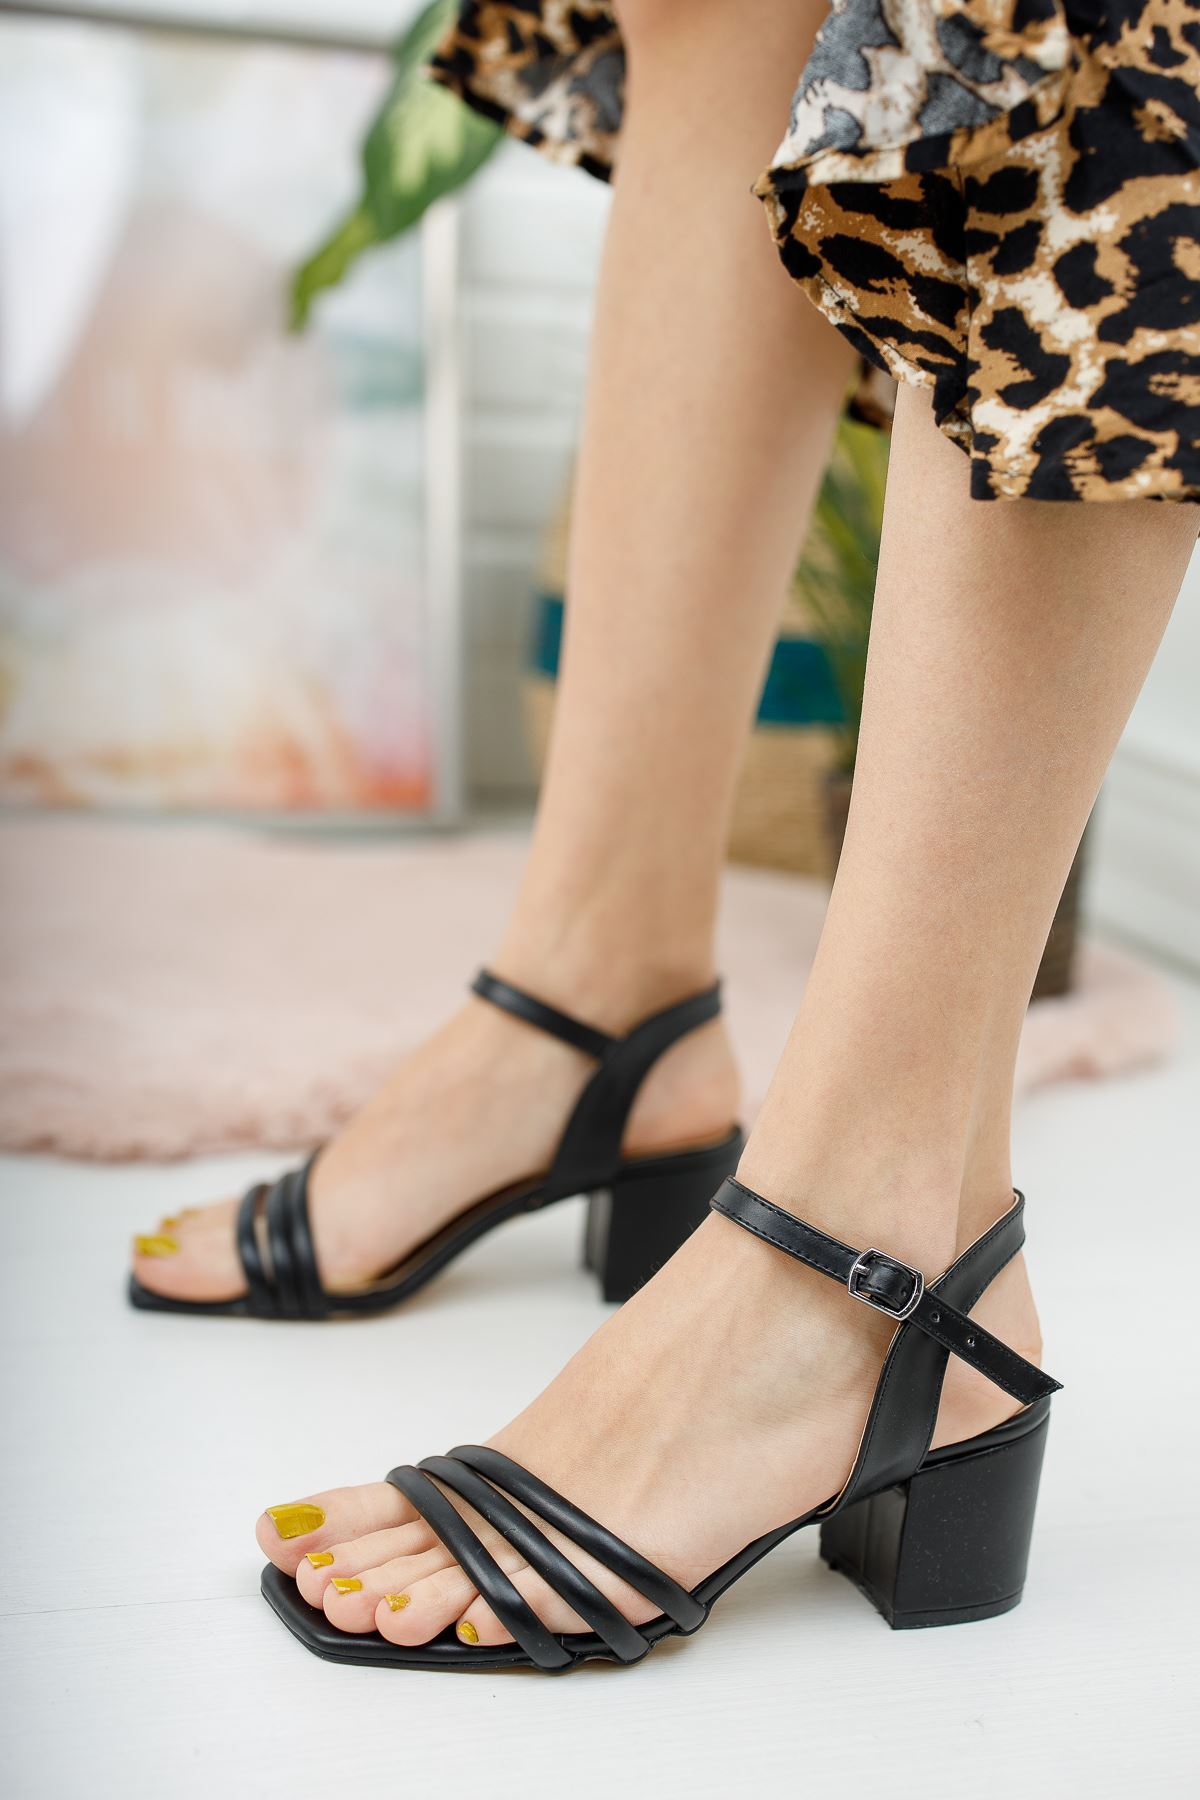 Kadın Holla Kısa Topuklu Mat Deri Siyah Ayakkabı